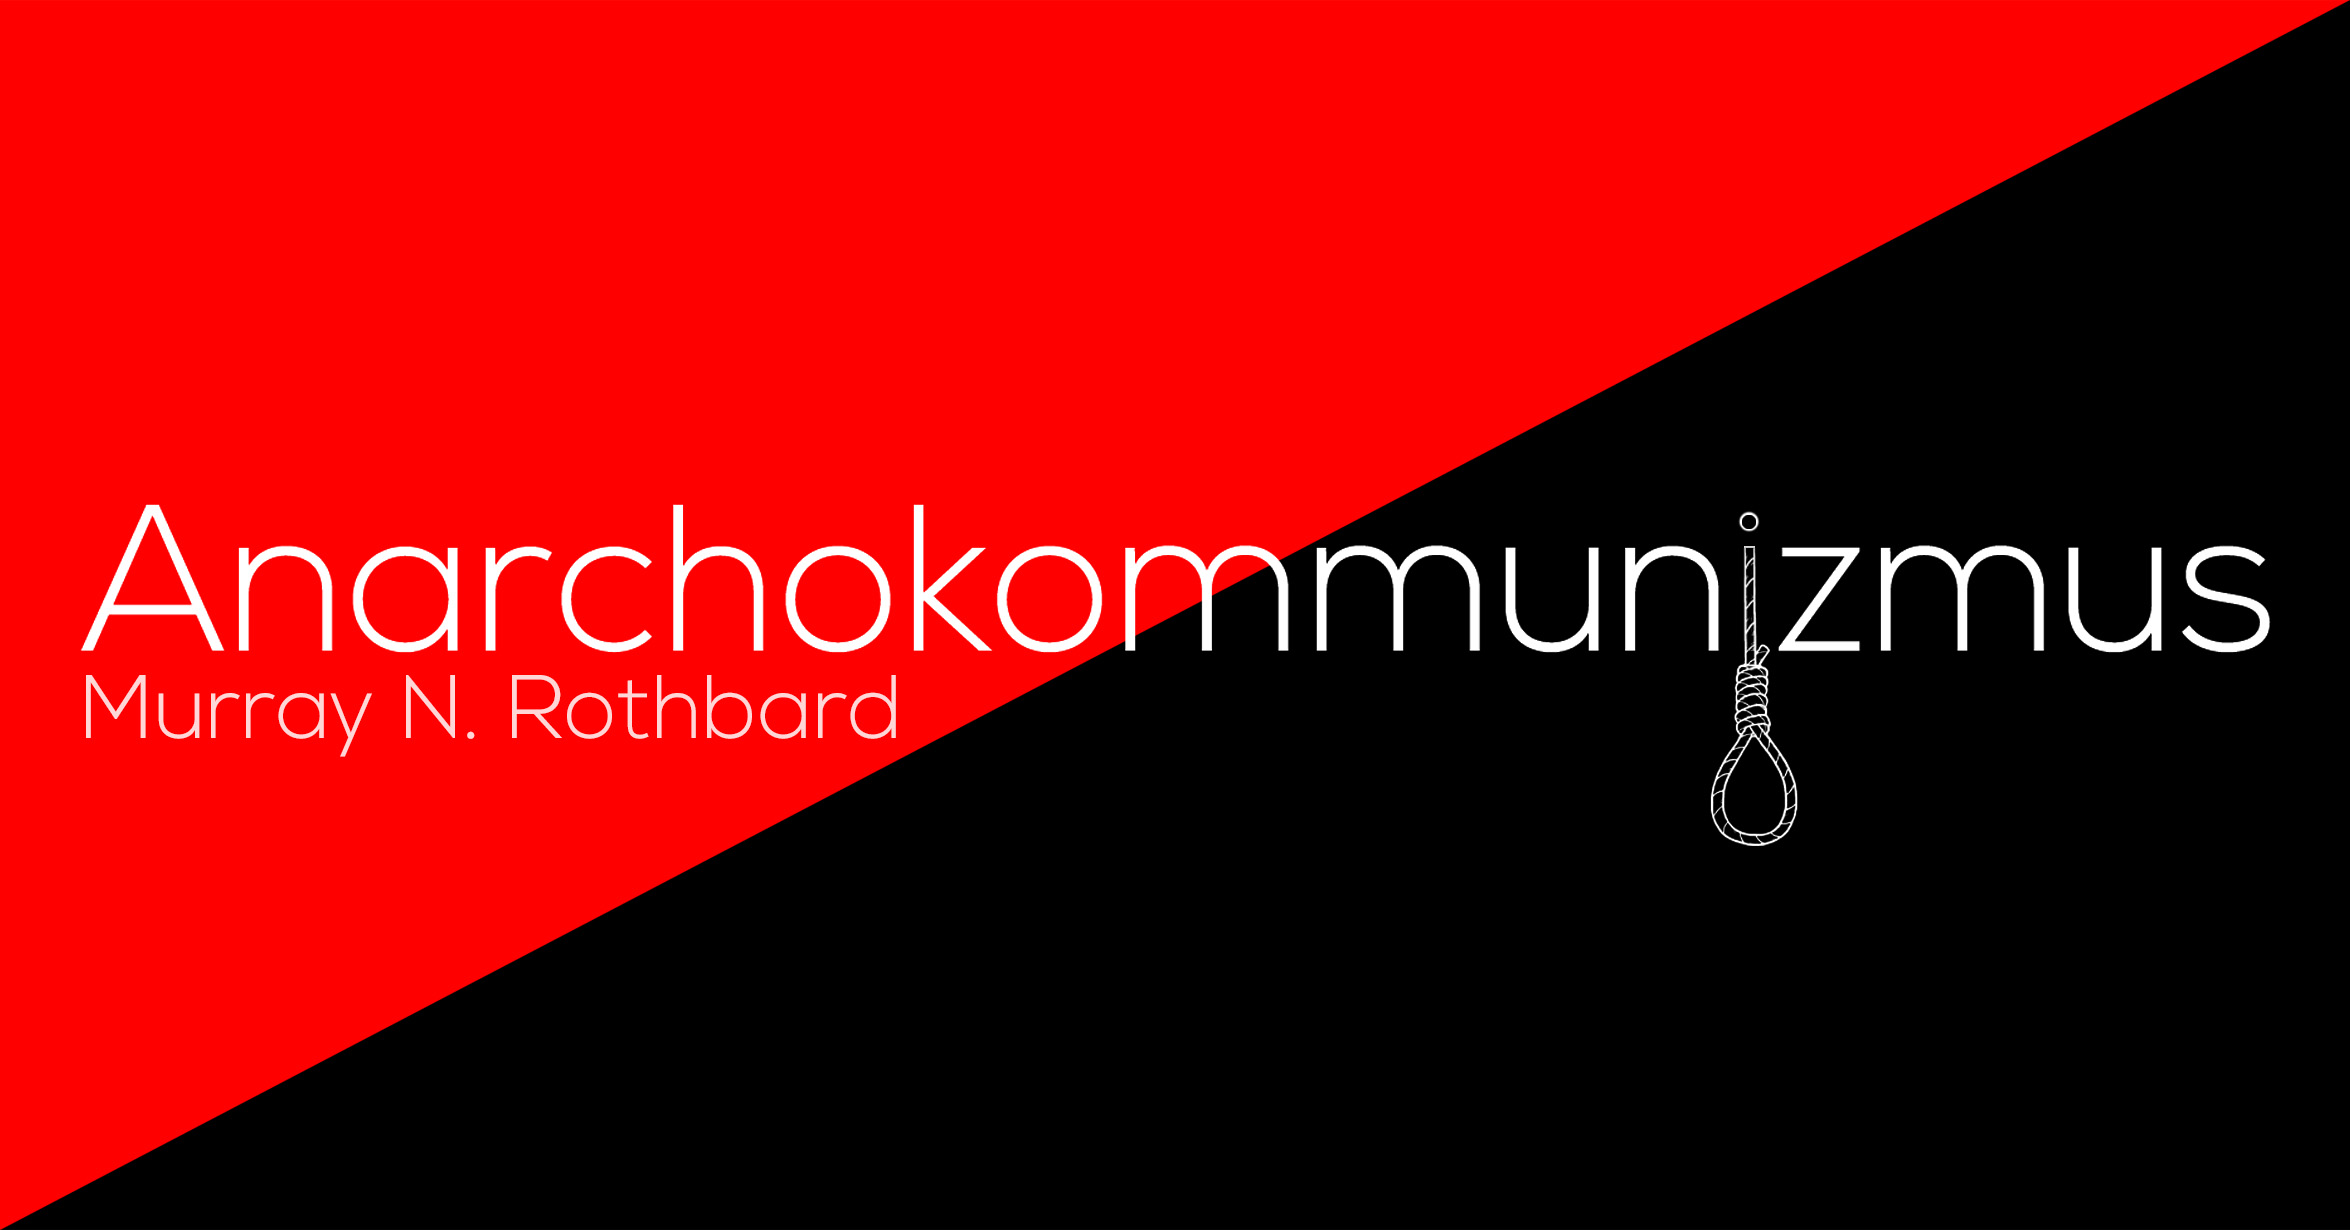 Murray N. Rothbard - Anarchokommunizmus